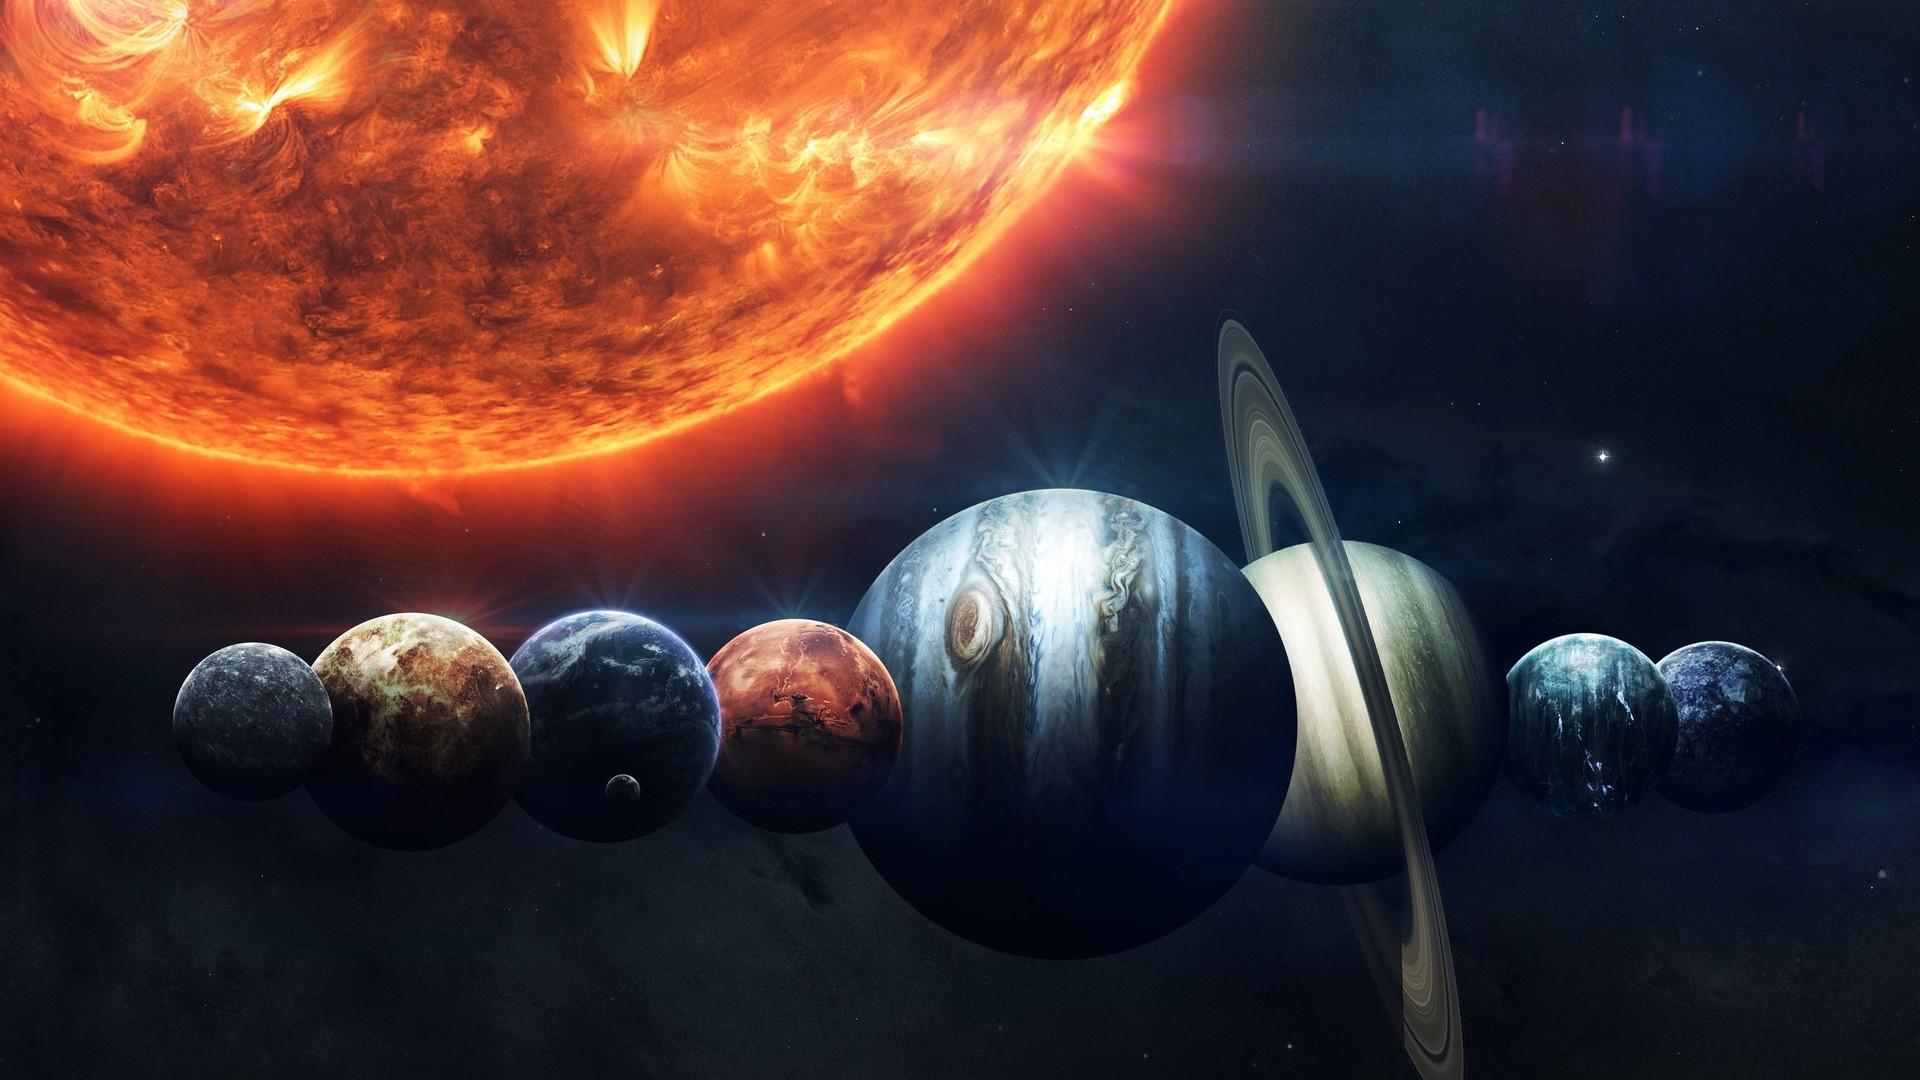 Solar System PC Wallpaper HD